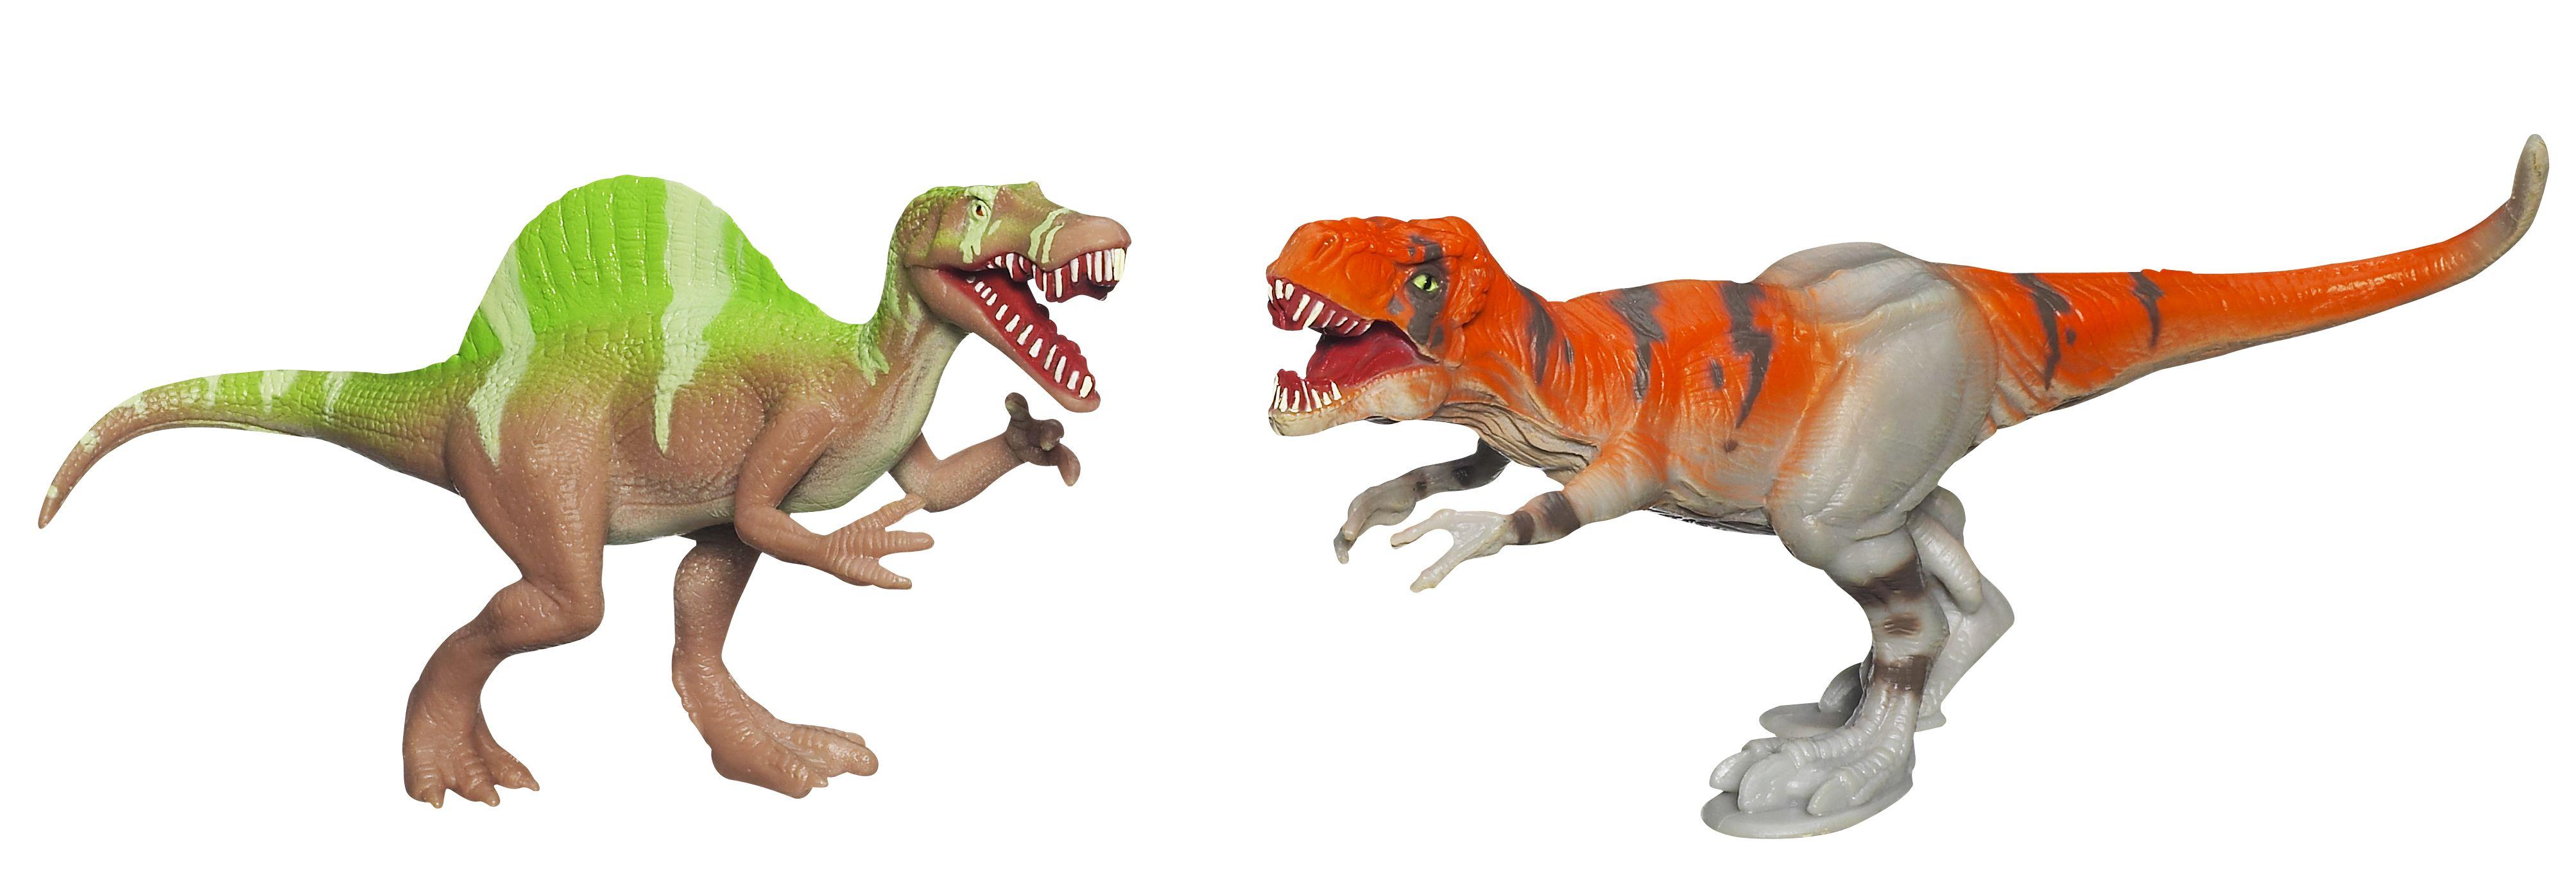 Spinosaurus Vs Giganotosaurus Vs T Rex | www.imgkid.com ...